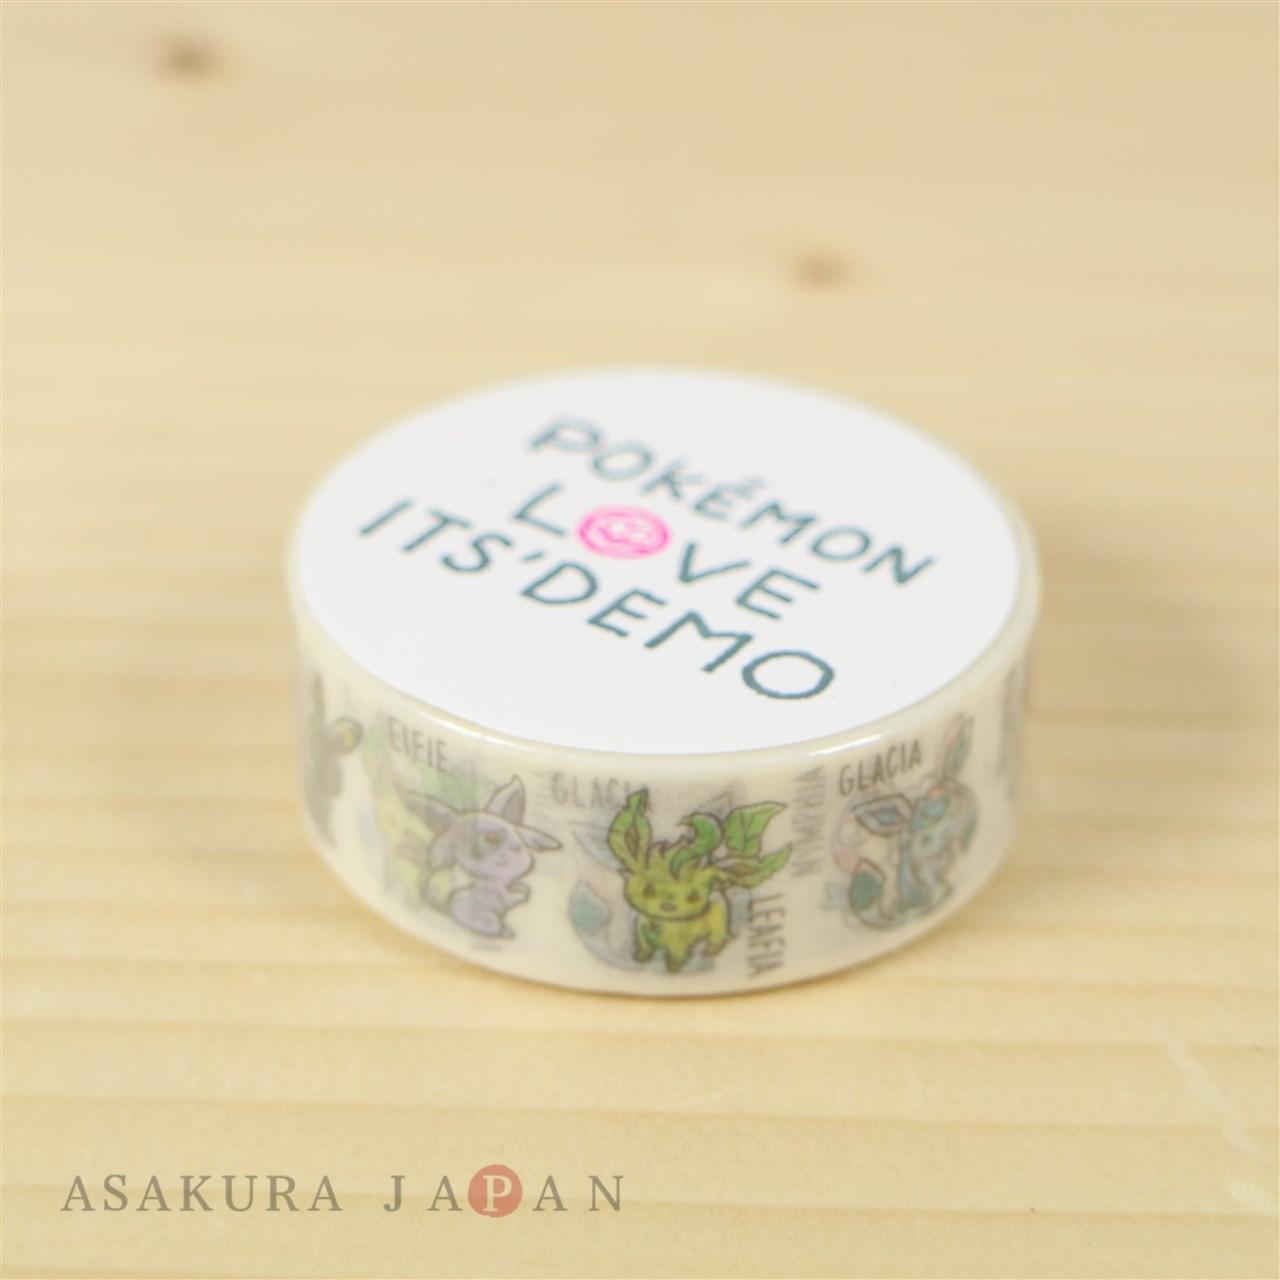 POKEMON LOVE ITS\' DEMO Decorative Sticky Paper Masking Tape #5 ...